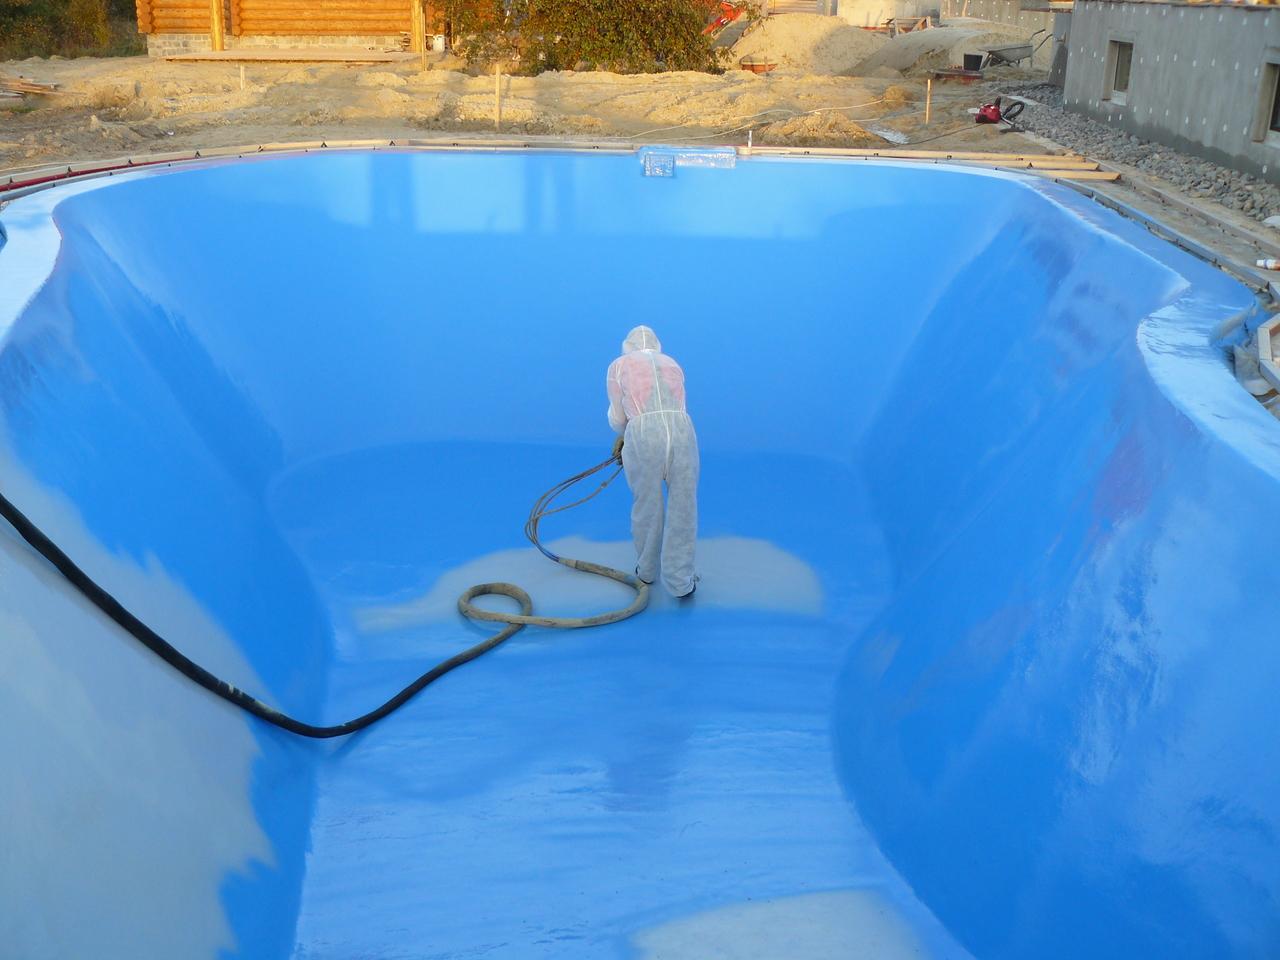 Гидроизоляция бассейнов под плитку: технология